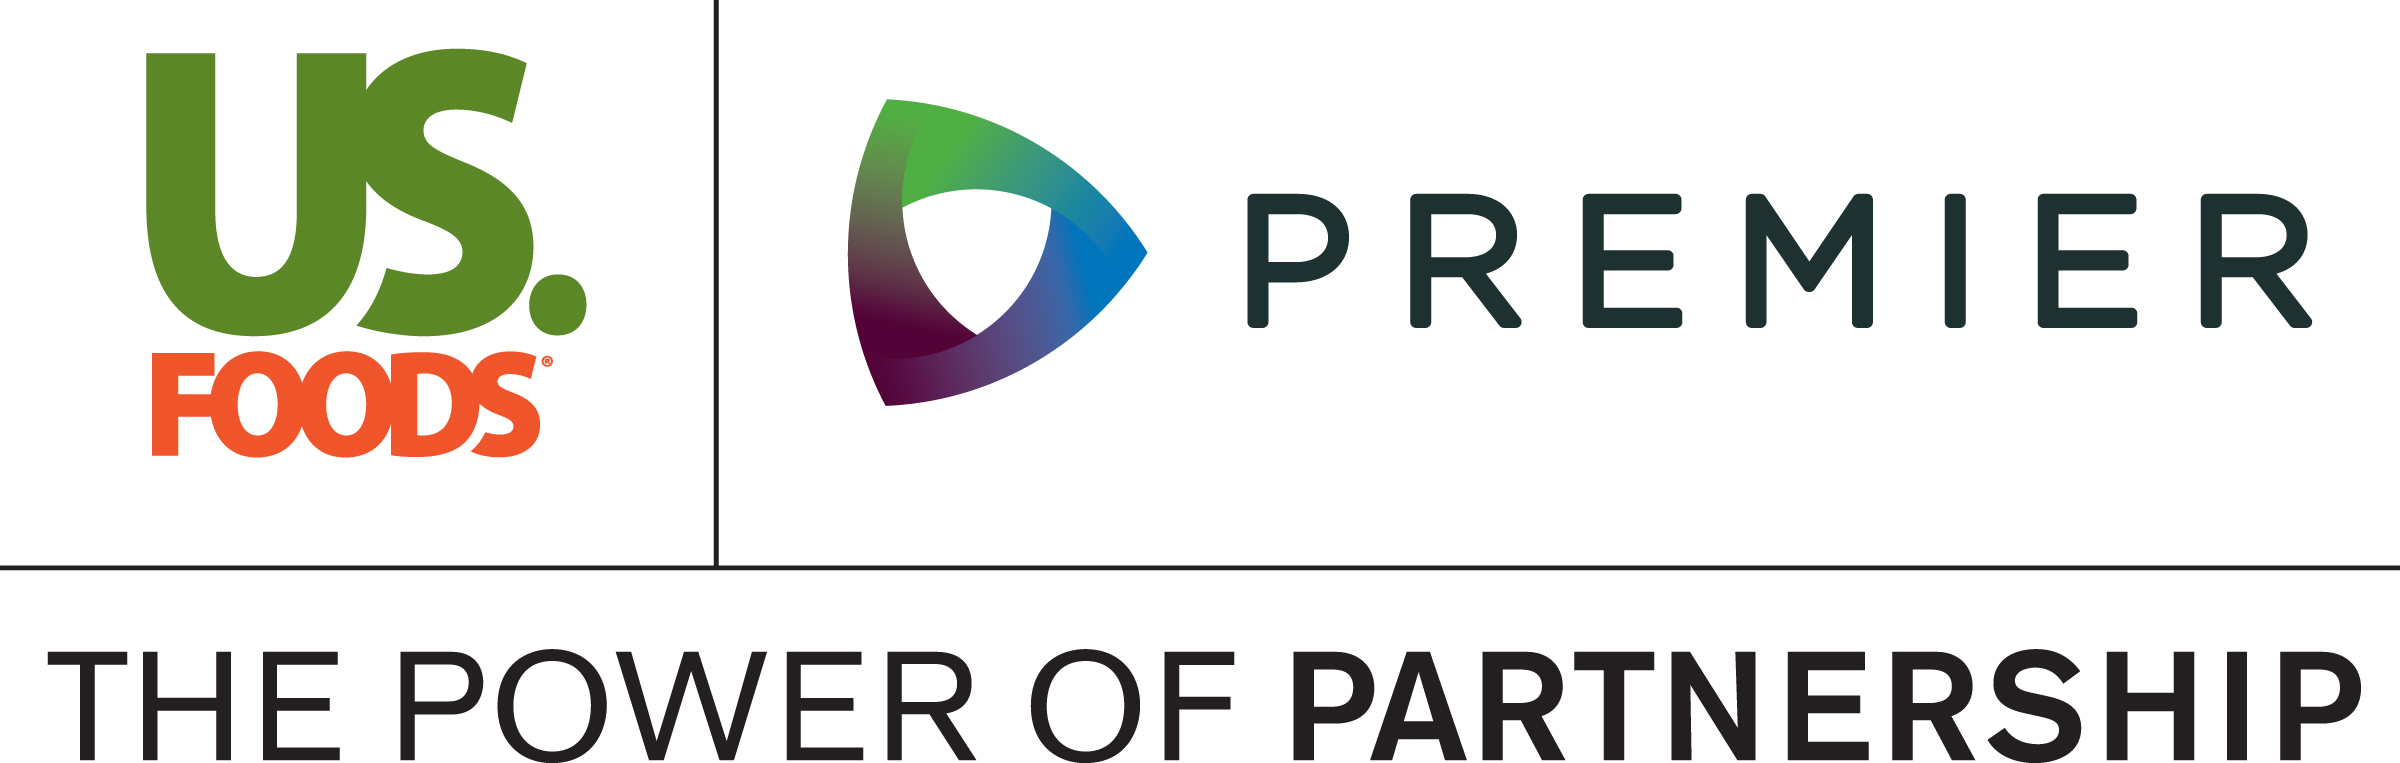 Power_of_Partnership_CMYK